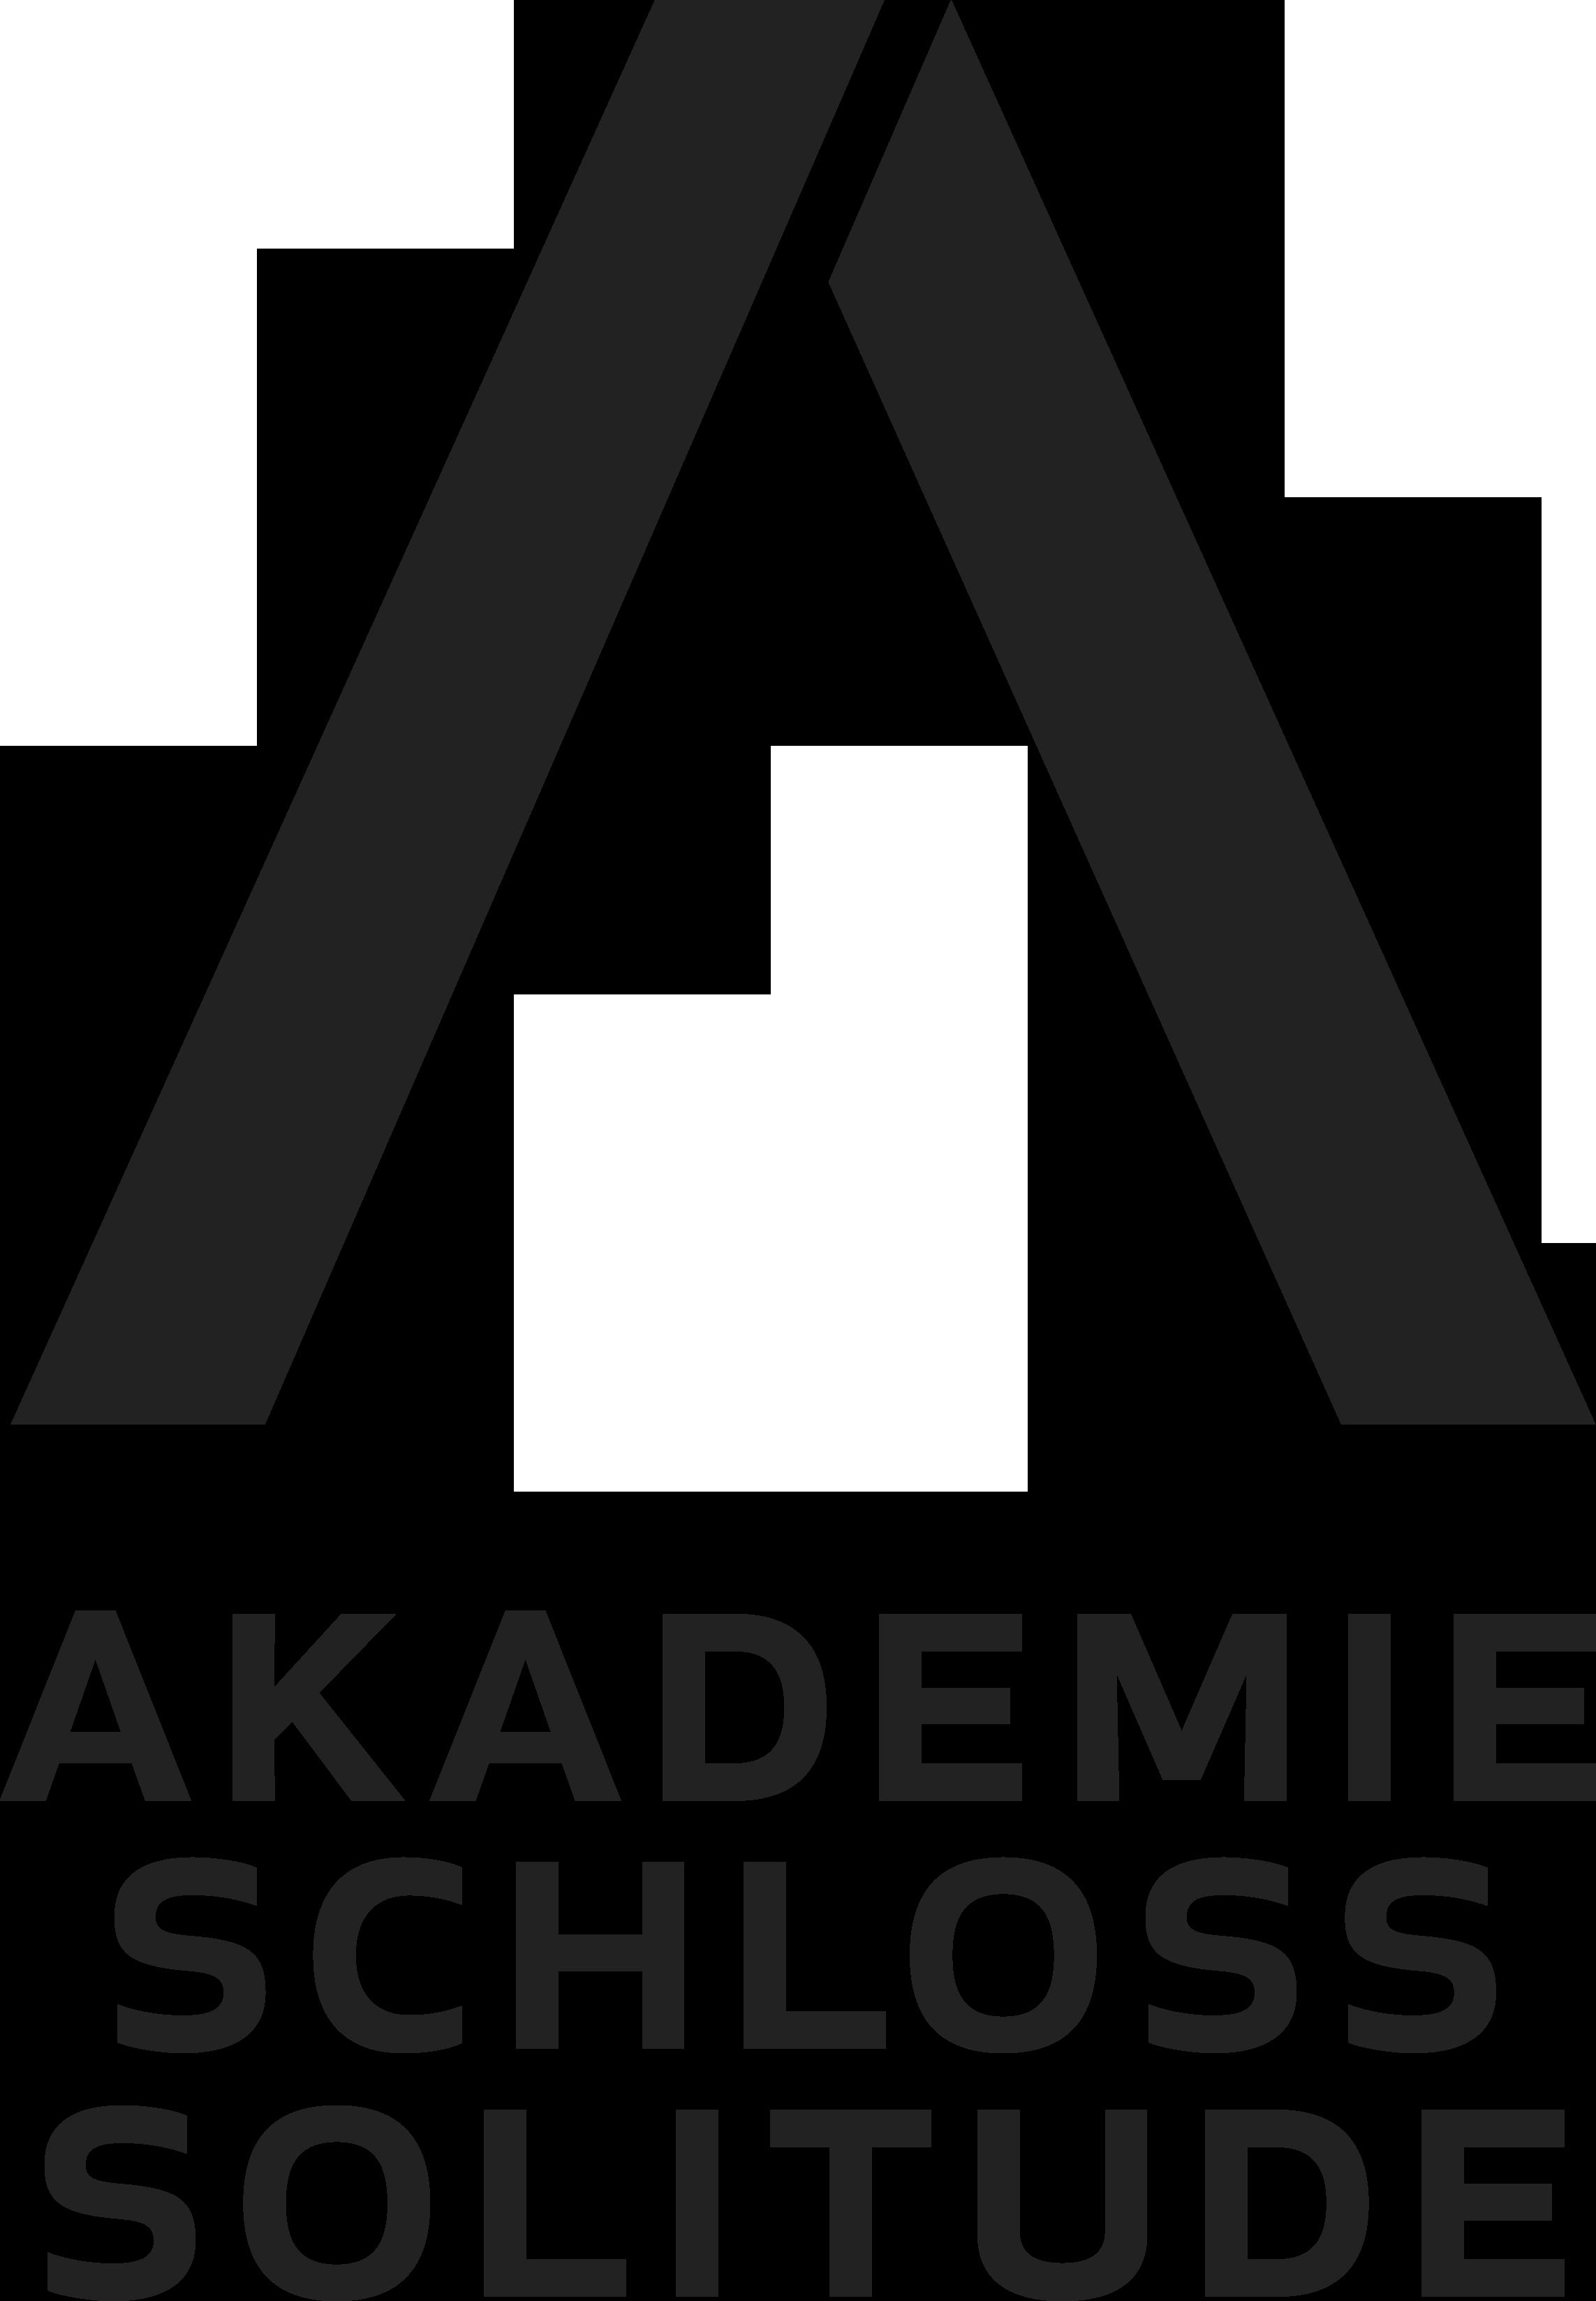 Akadememie Schloss Solitude